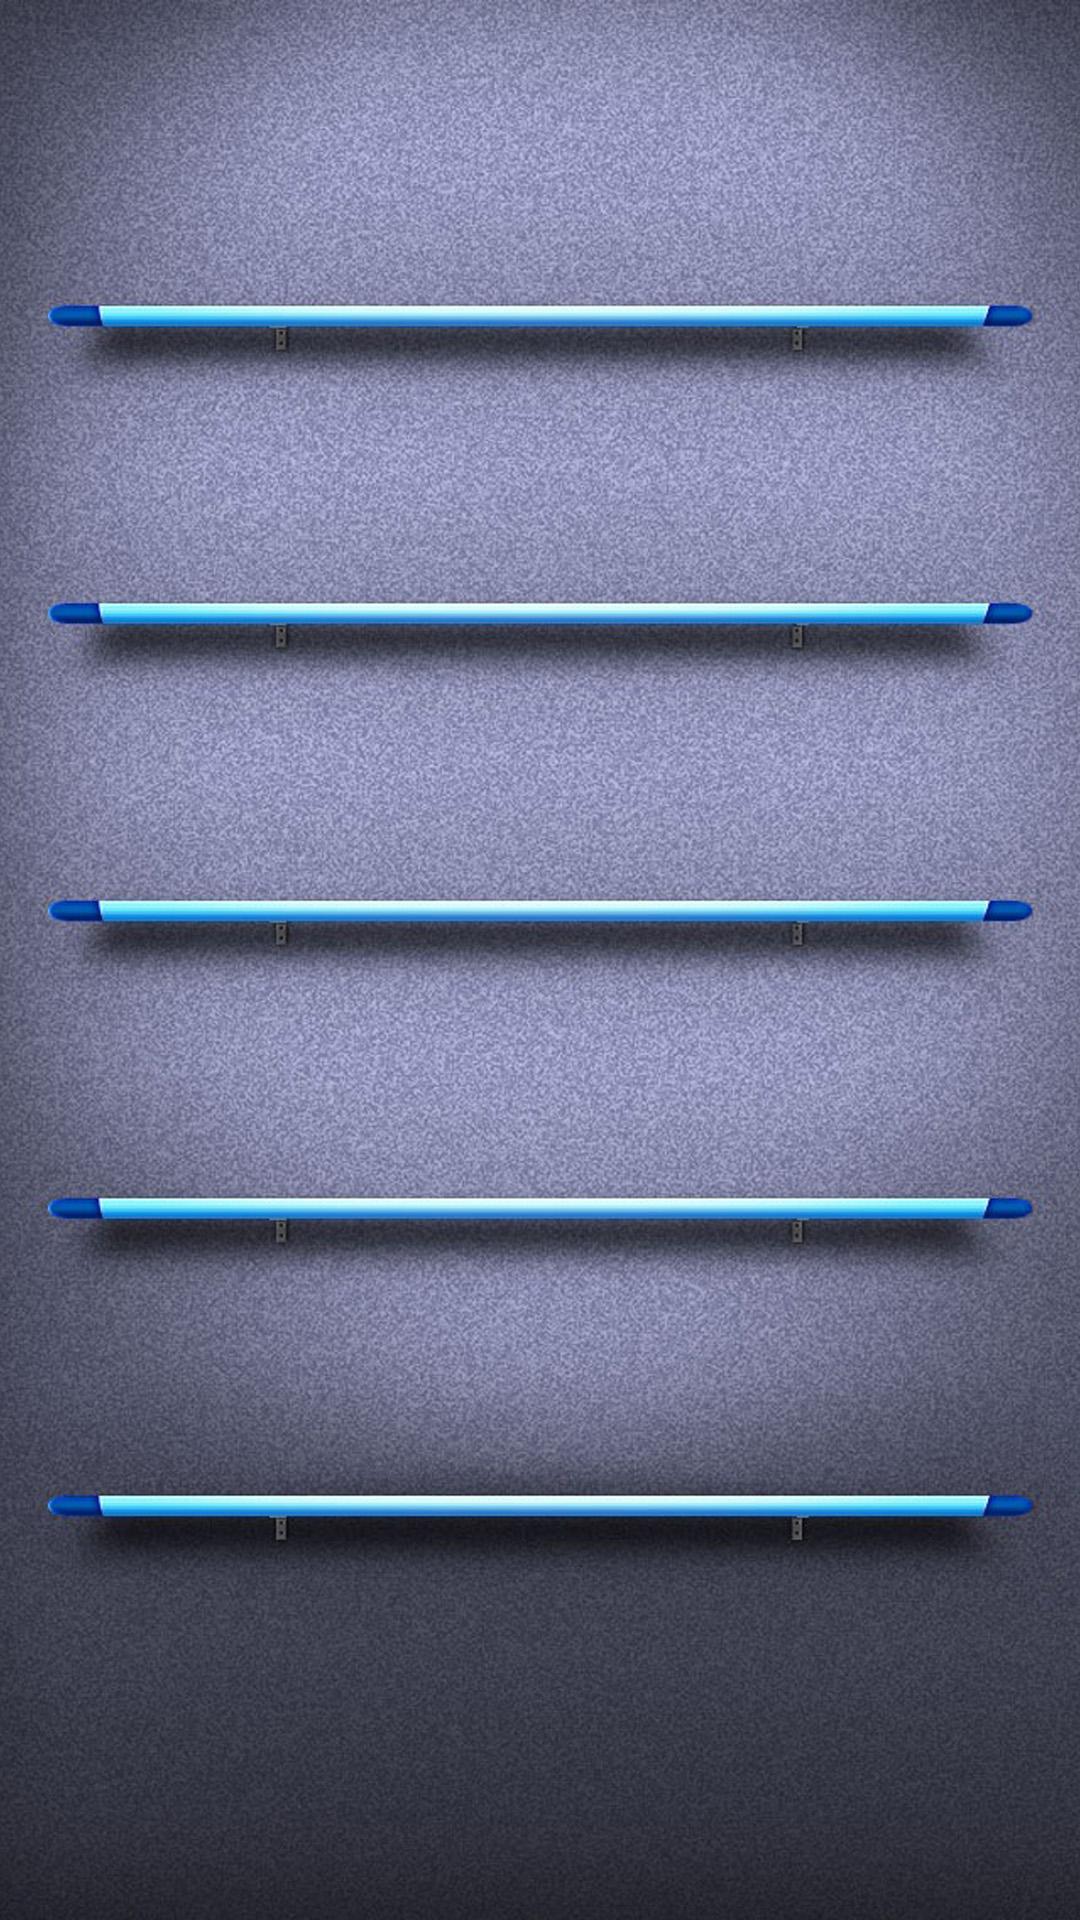 Shelf iPhone 6 Plus Wallpaper 20 iPhone 6 Plus Wallpapers HD 1080x1920